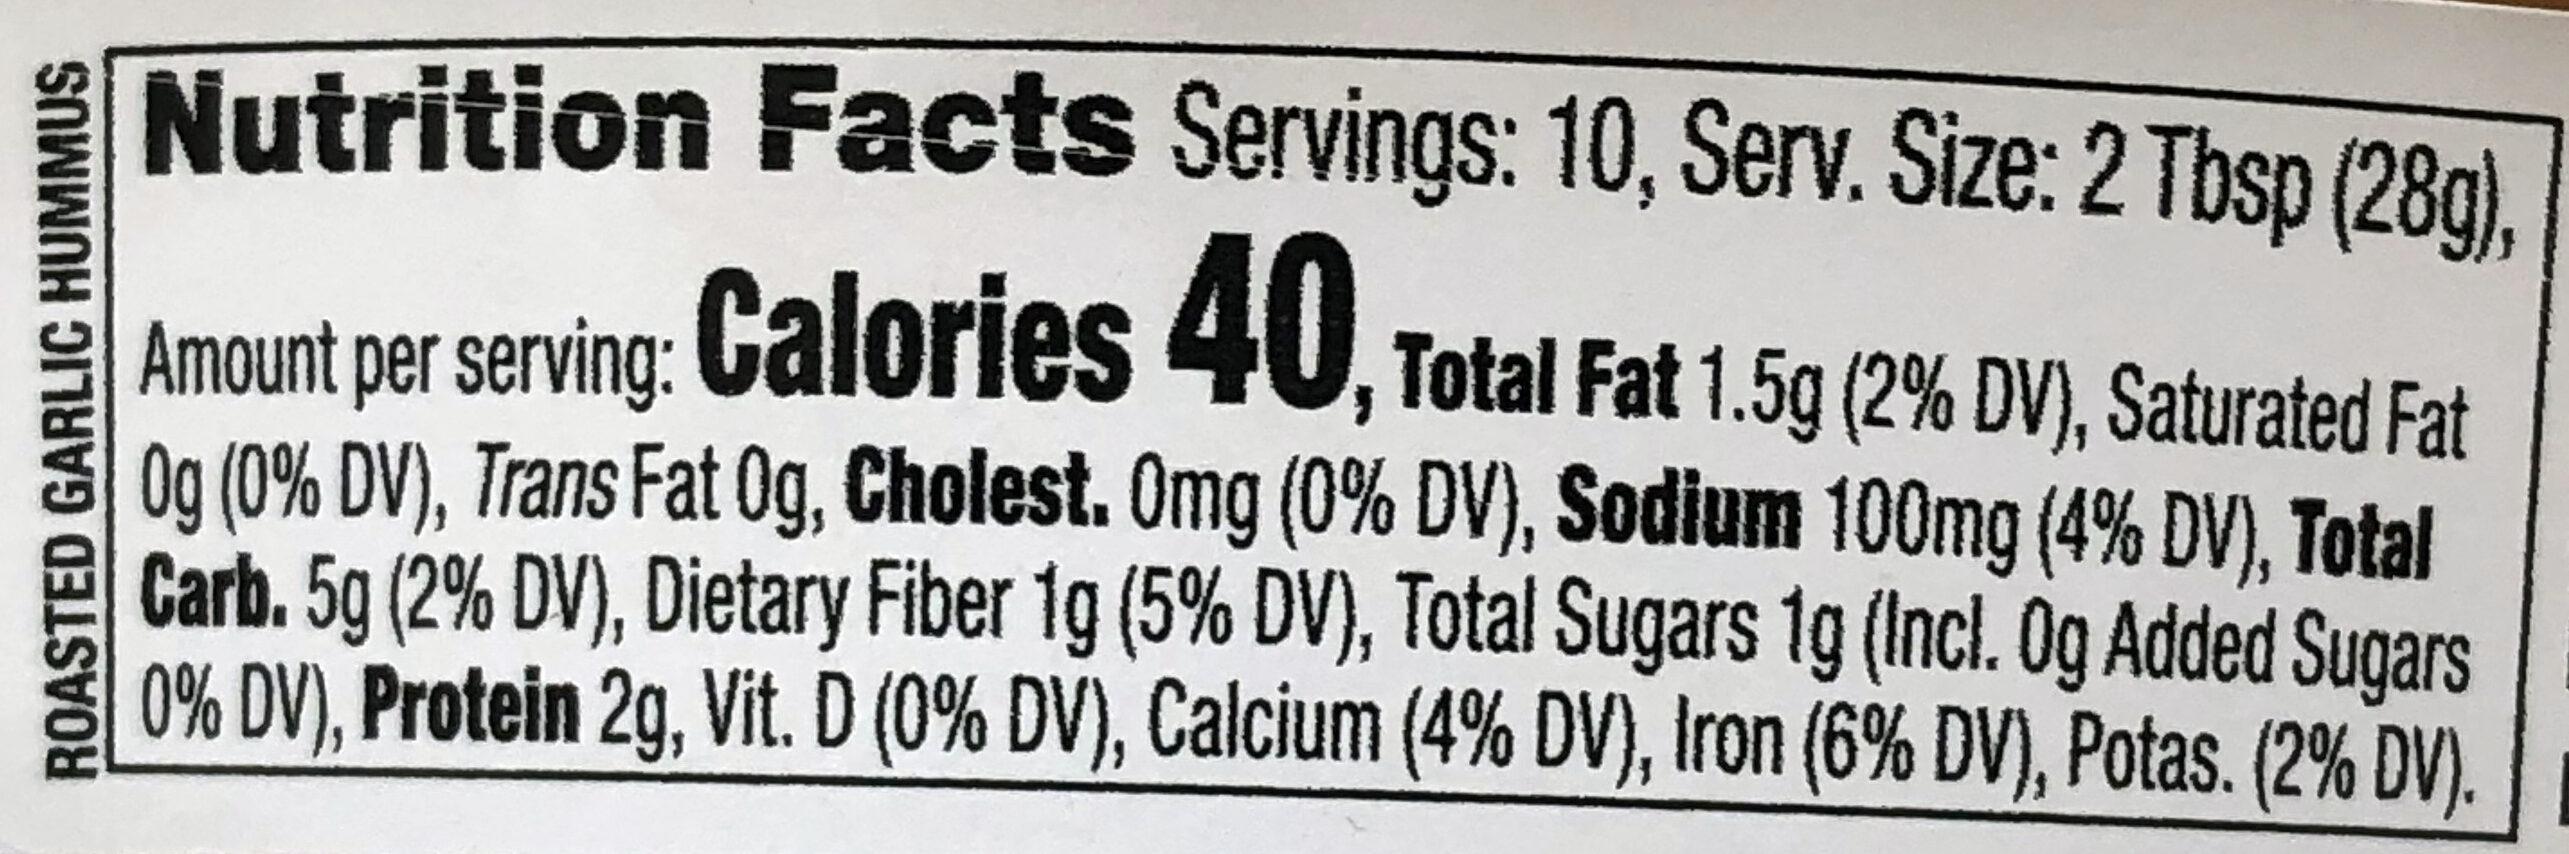 Roasted Garlic Hummus - Informations nutritionnelles